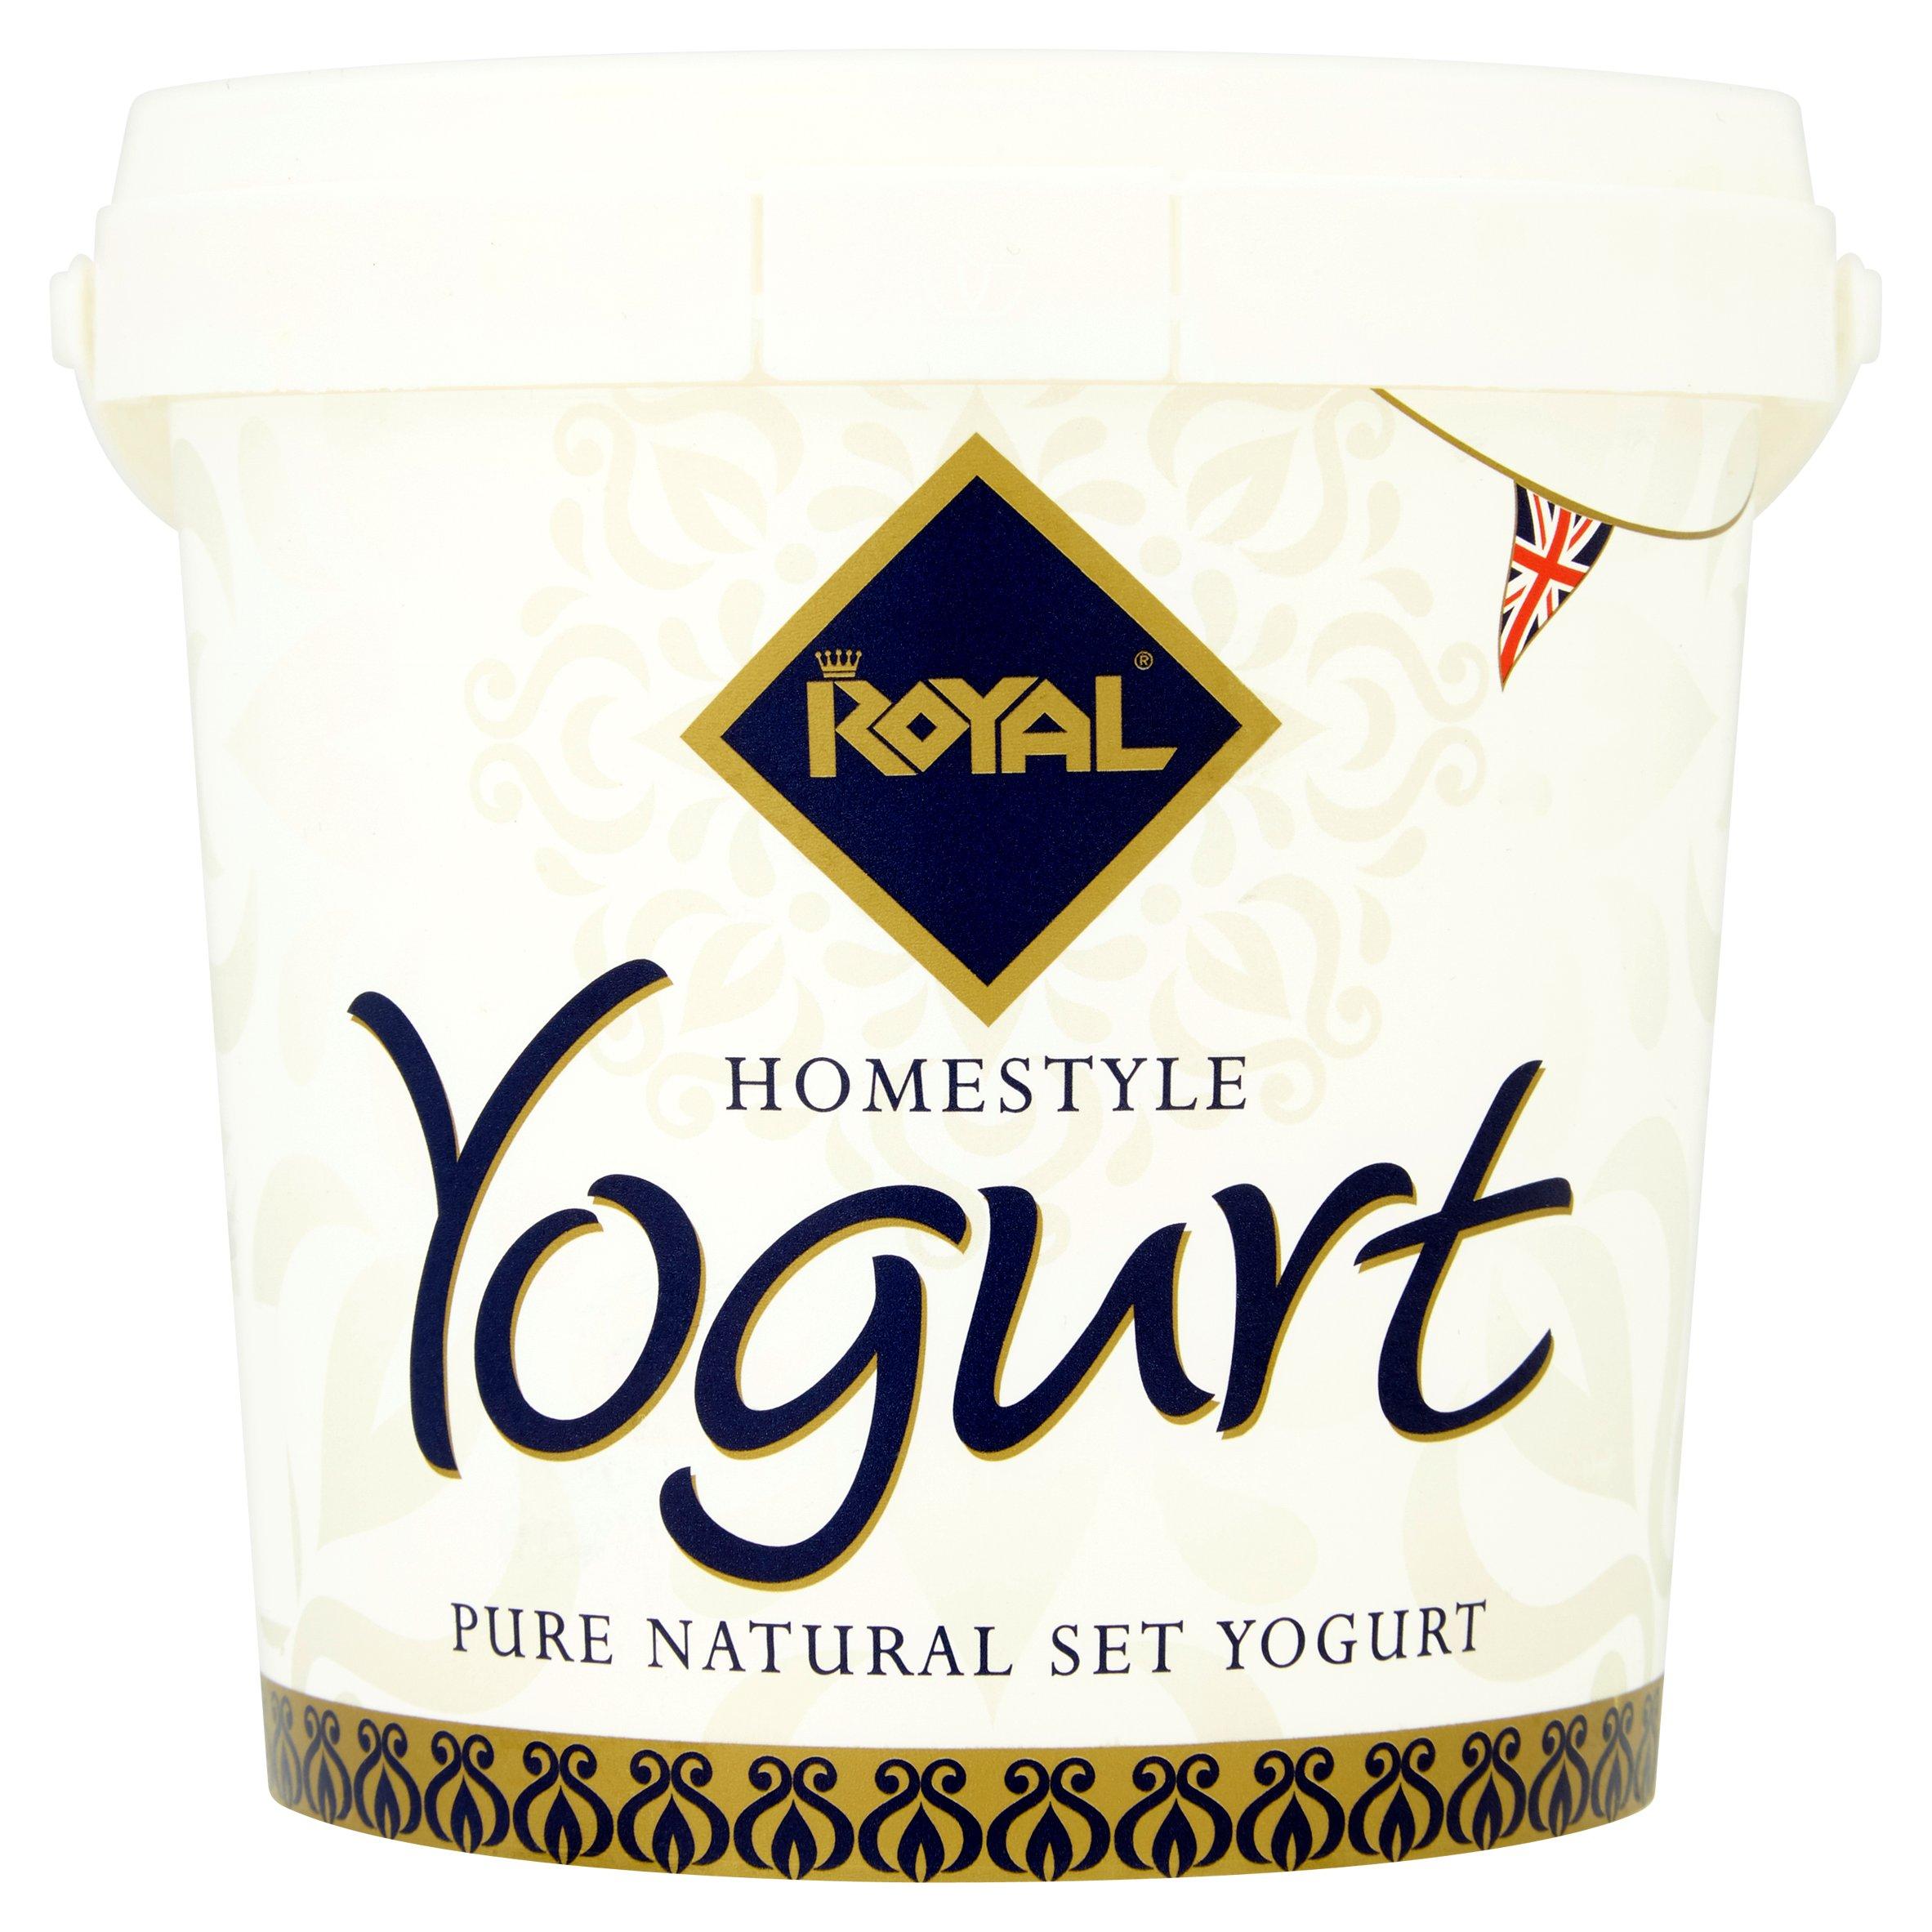 Royal Homestyle Pure Natural Set Yogurt 1Kg